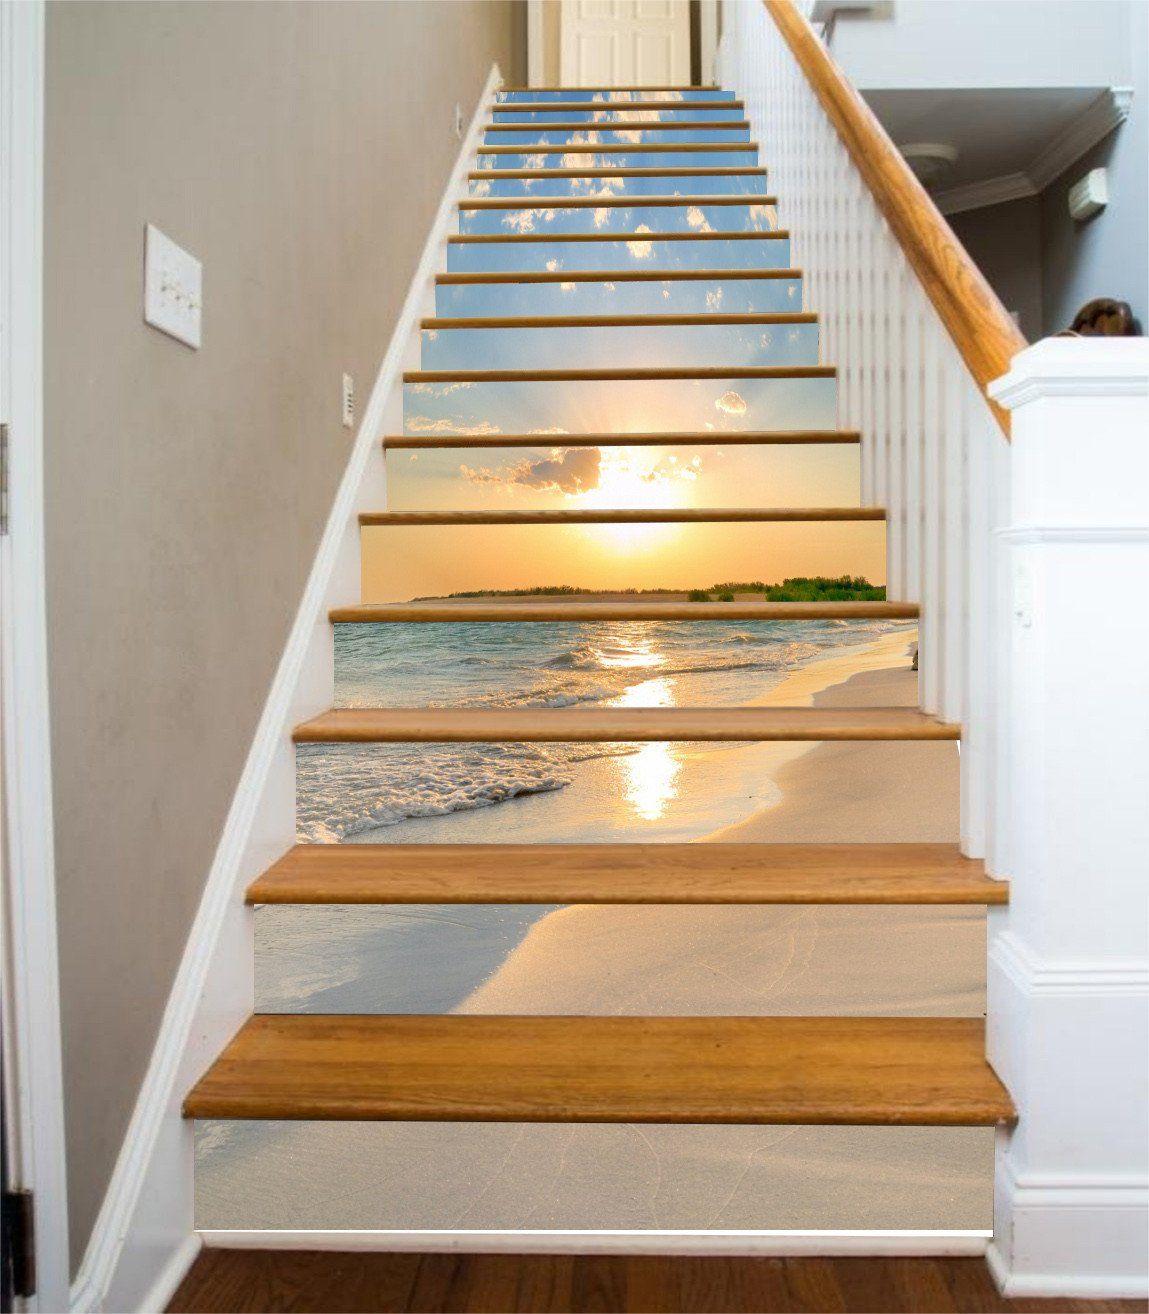 Best 3D Beach Sunset 321 Stair Risers Stair Risers Staircase 400 x 300